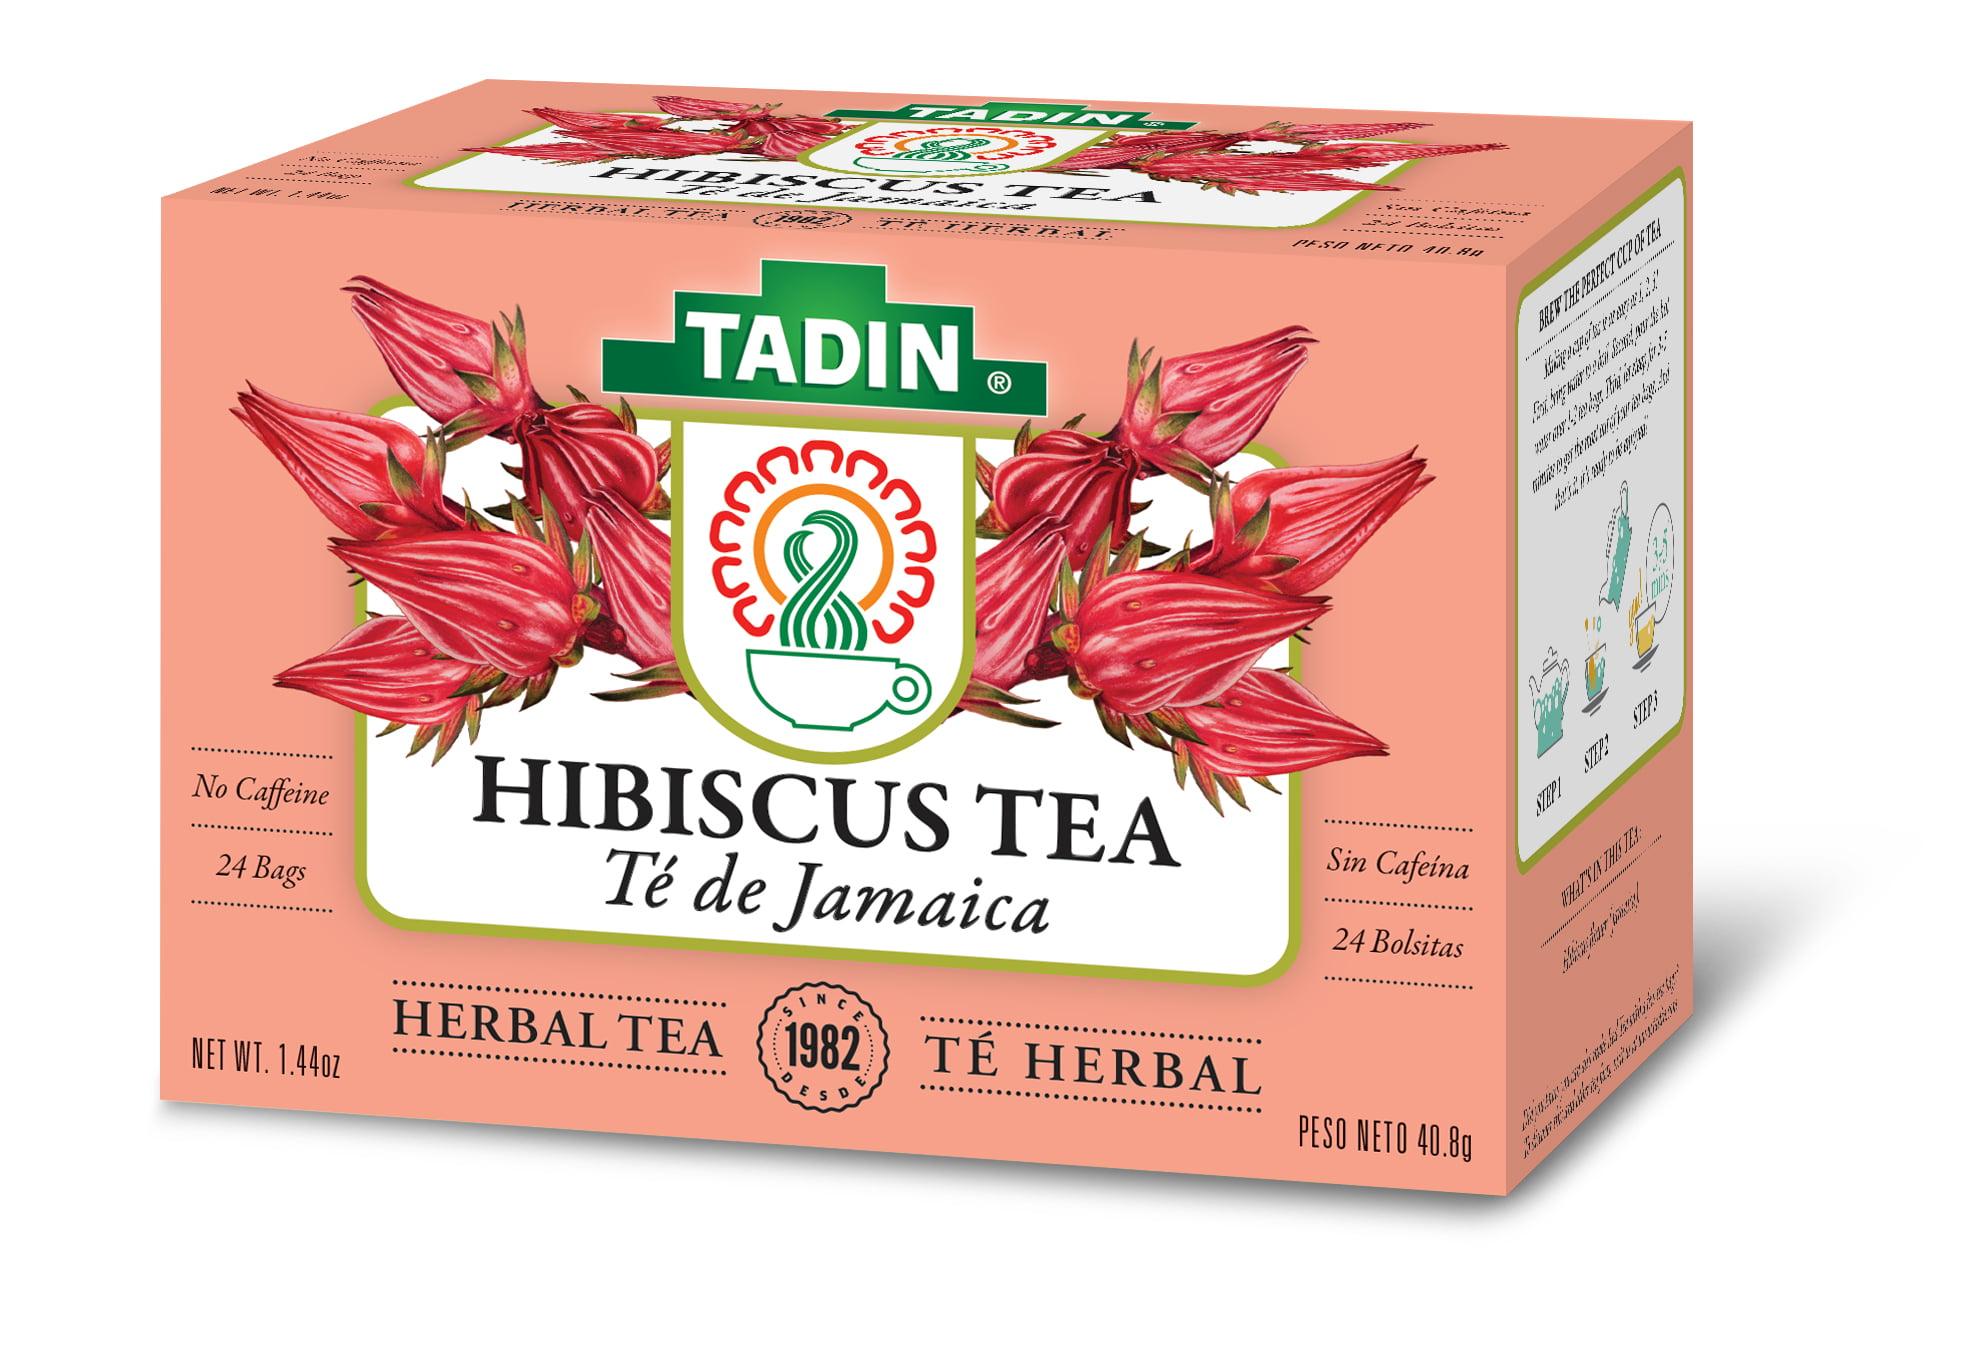 Tadin herb tea co hibiscus herbal tea caffeine free 24 tea bags hibiscus herbal tea caffeine free 24 tea bags walmart izmirmasajfo